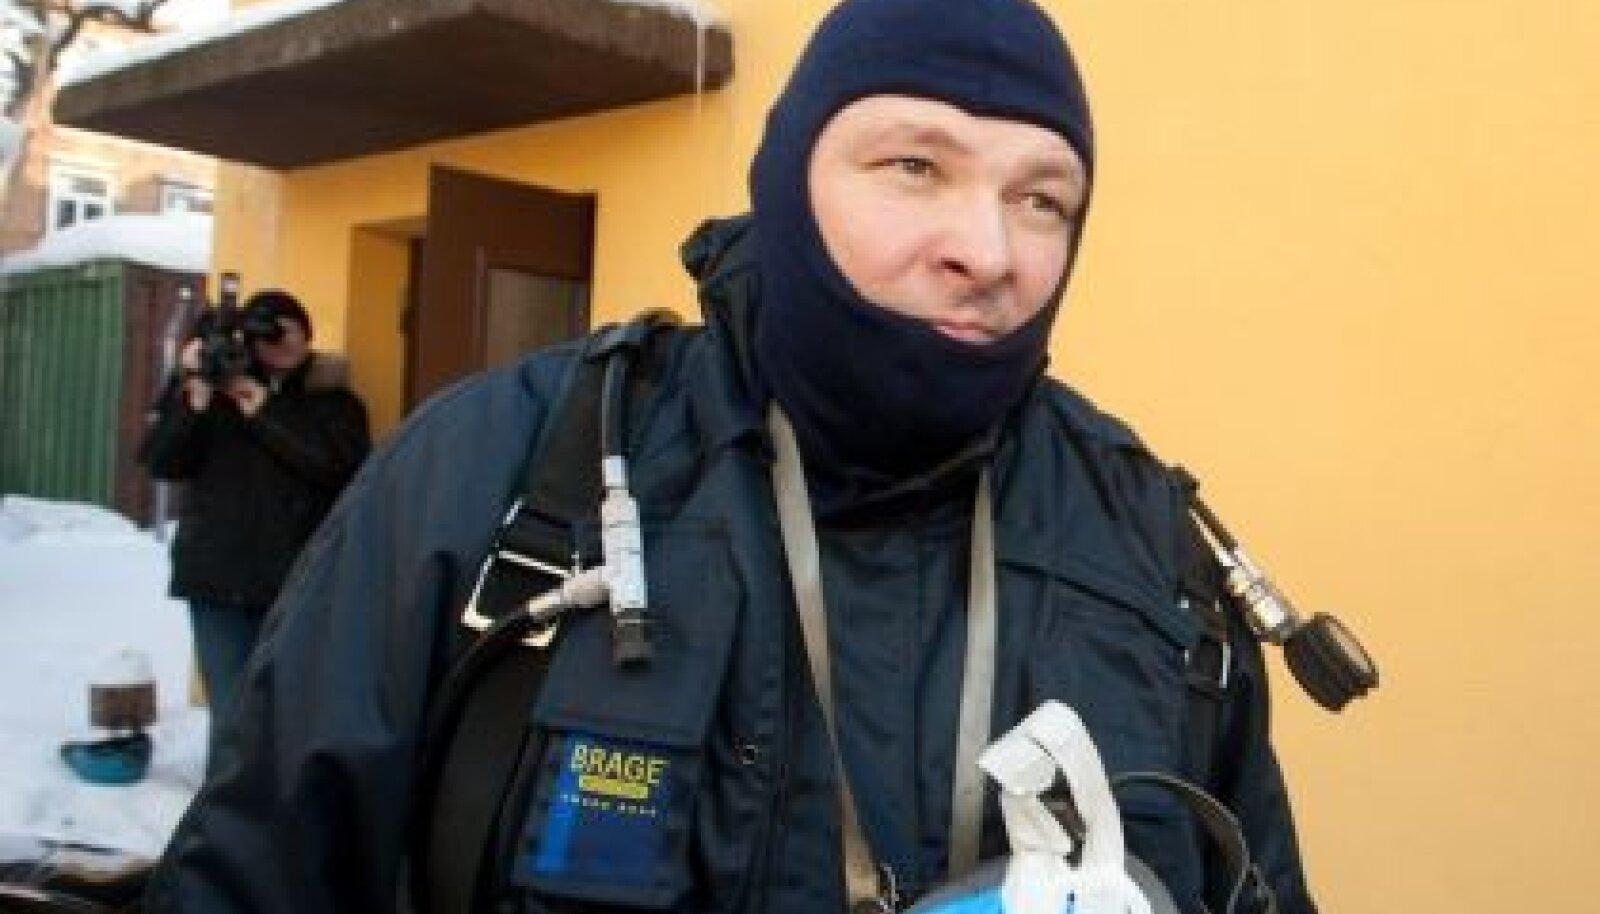 Marko Pomerants Lilleküla komandos